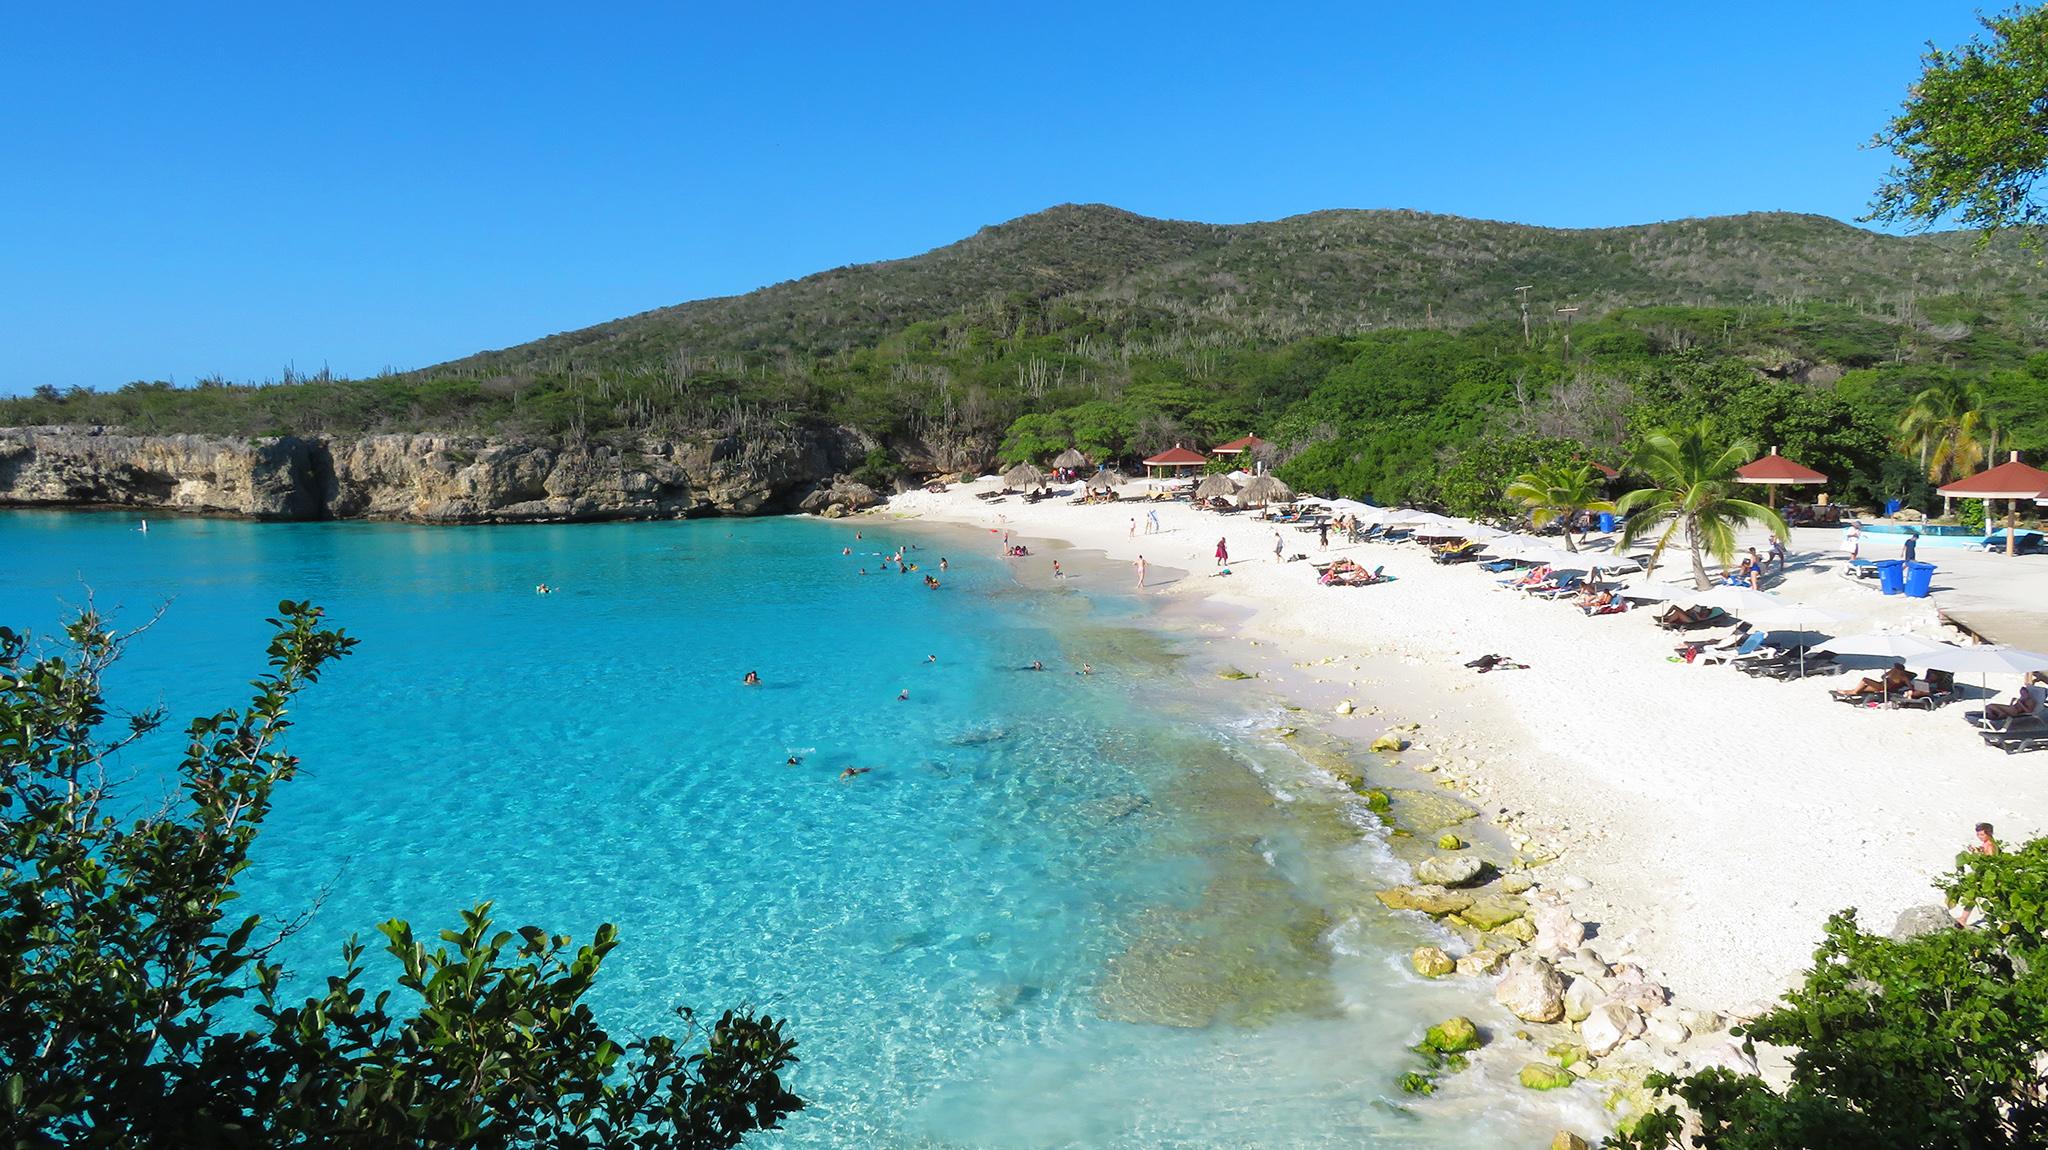 Karibik Kreuzfahrt Curacao Grote Knip Beach Ausflug